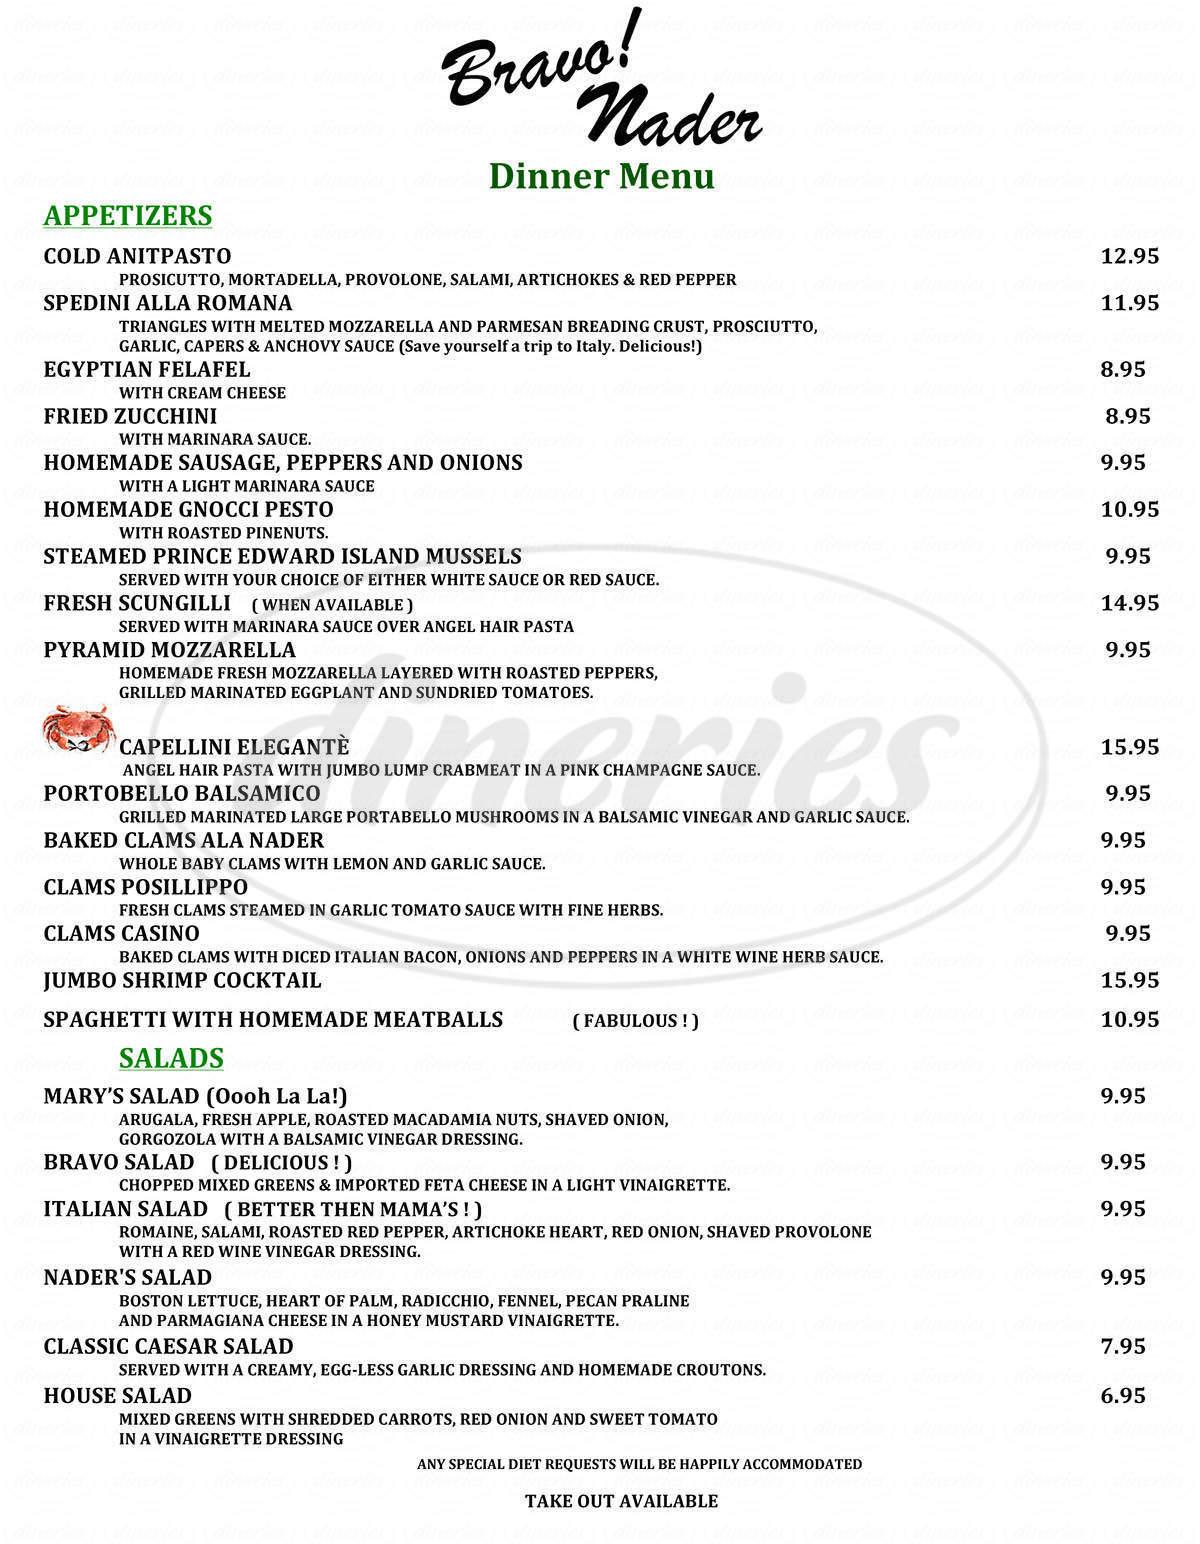 menu for Bravo Nader